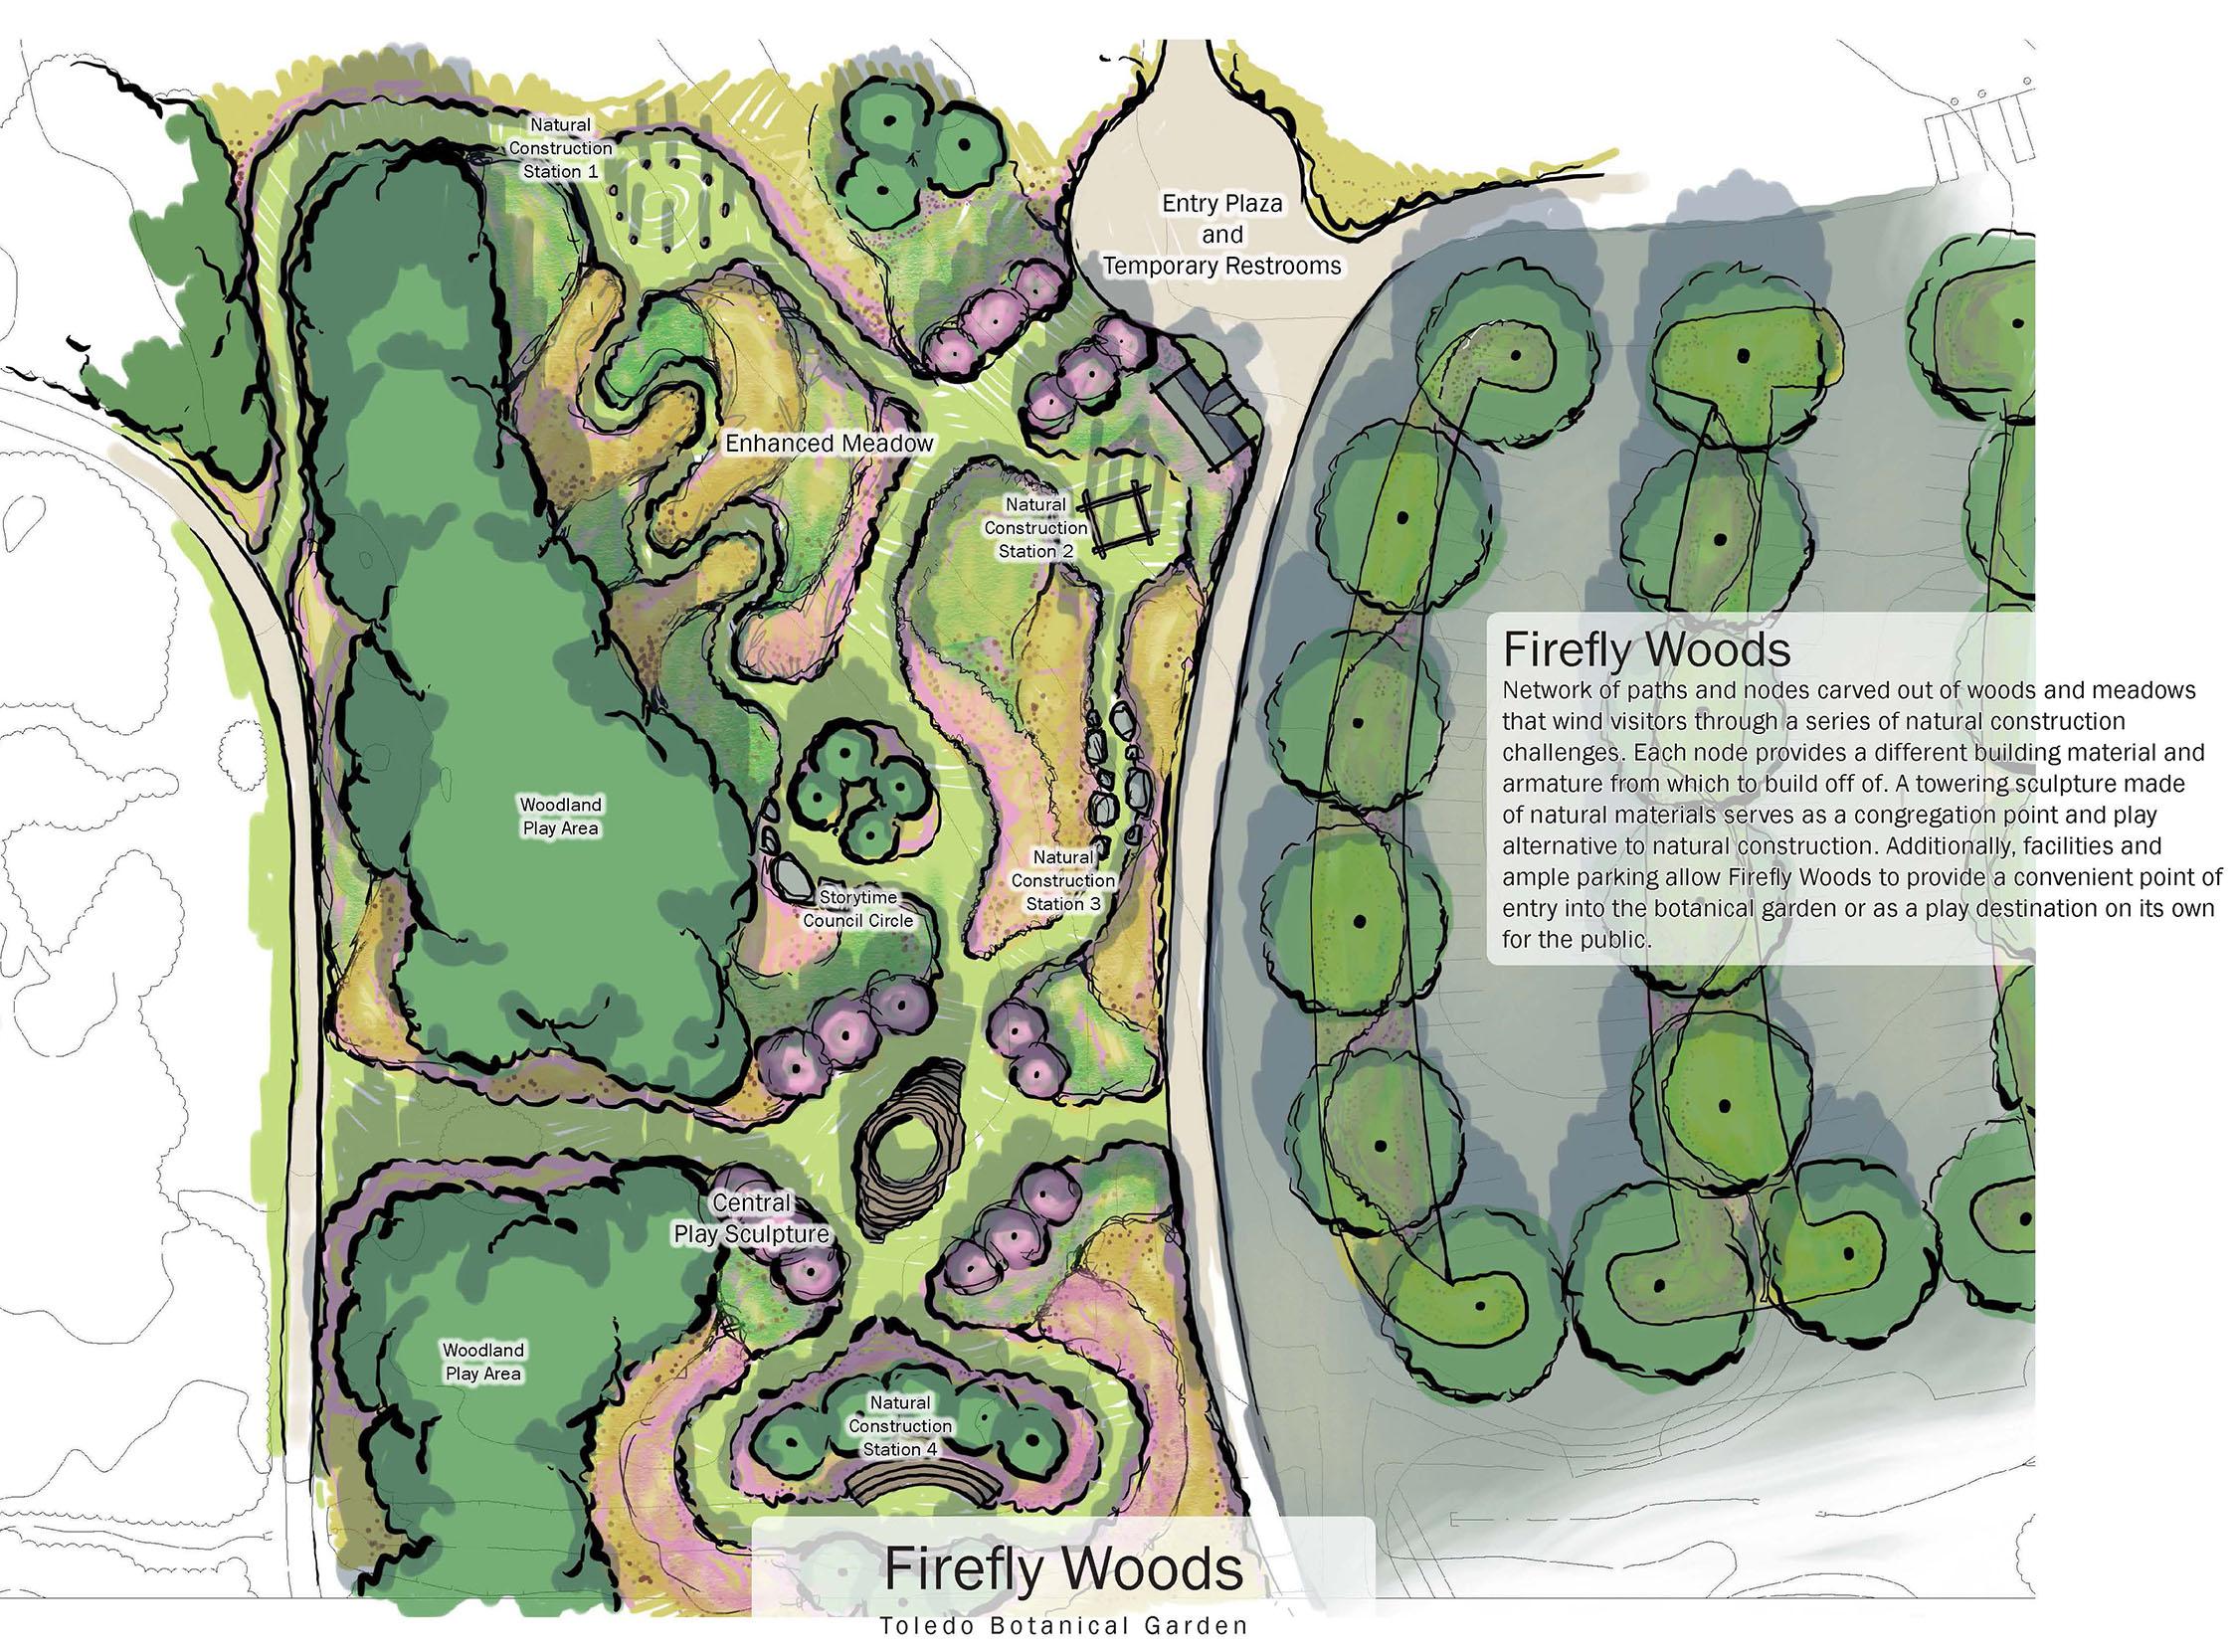 TBD_FireflyWoods_SchematicDesign_Plan_web.jpg